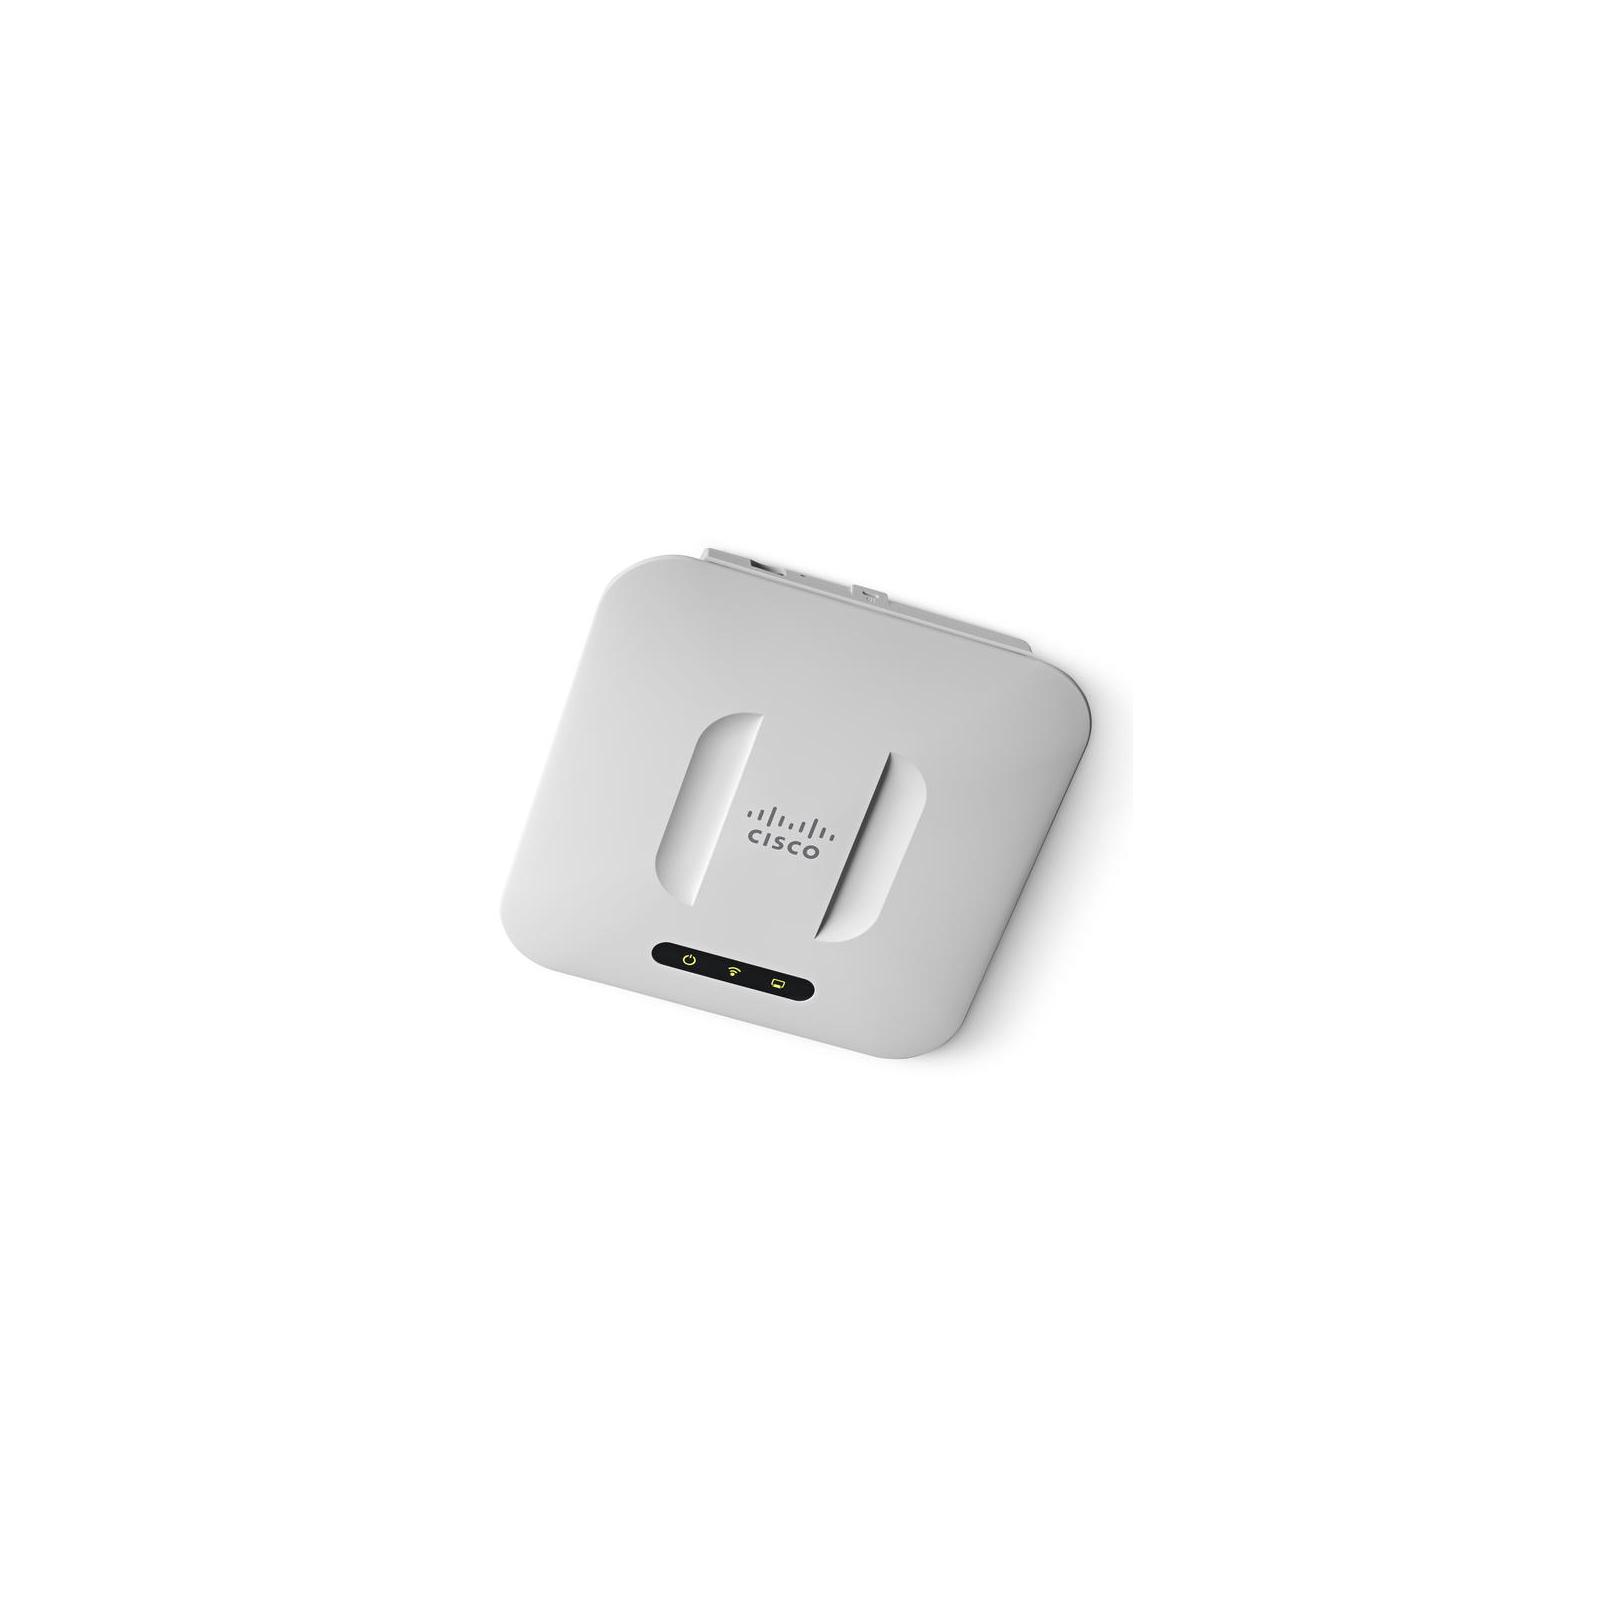 Точка доступа Wi-Fi Cisco WAP371 (WAP371-E-K9) изображение 4